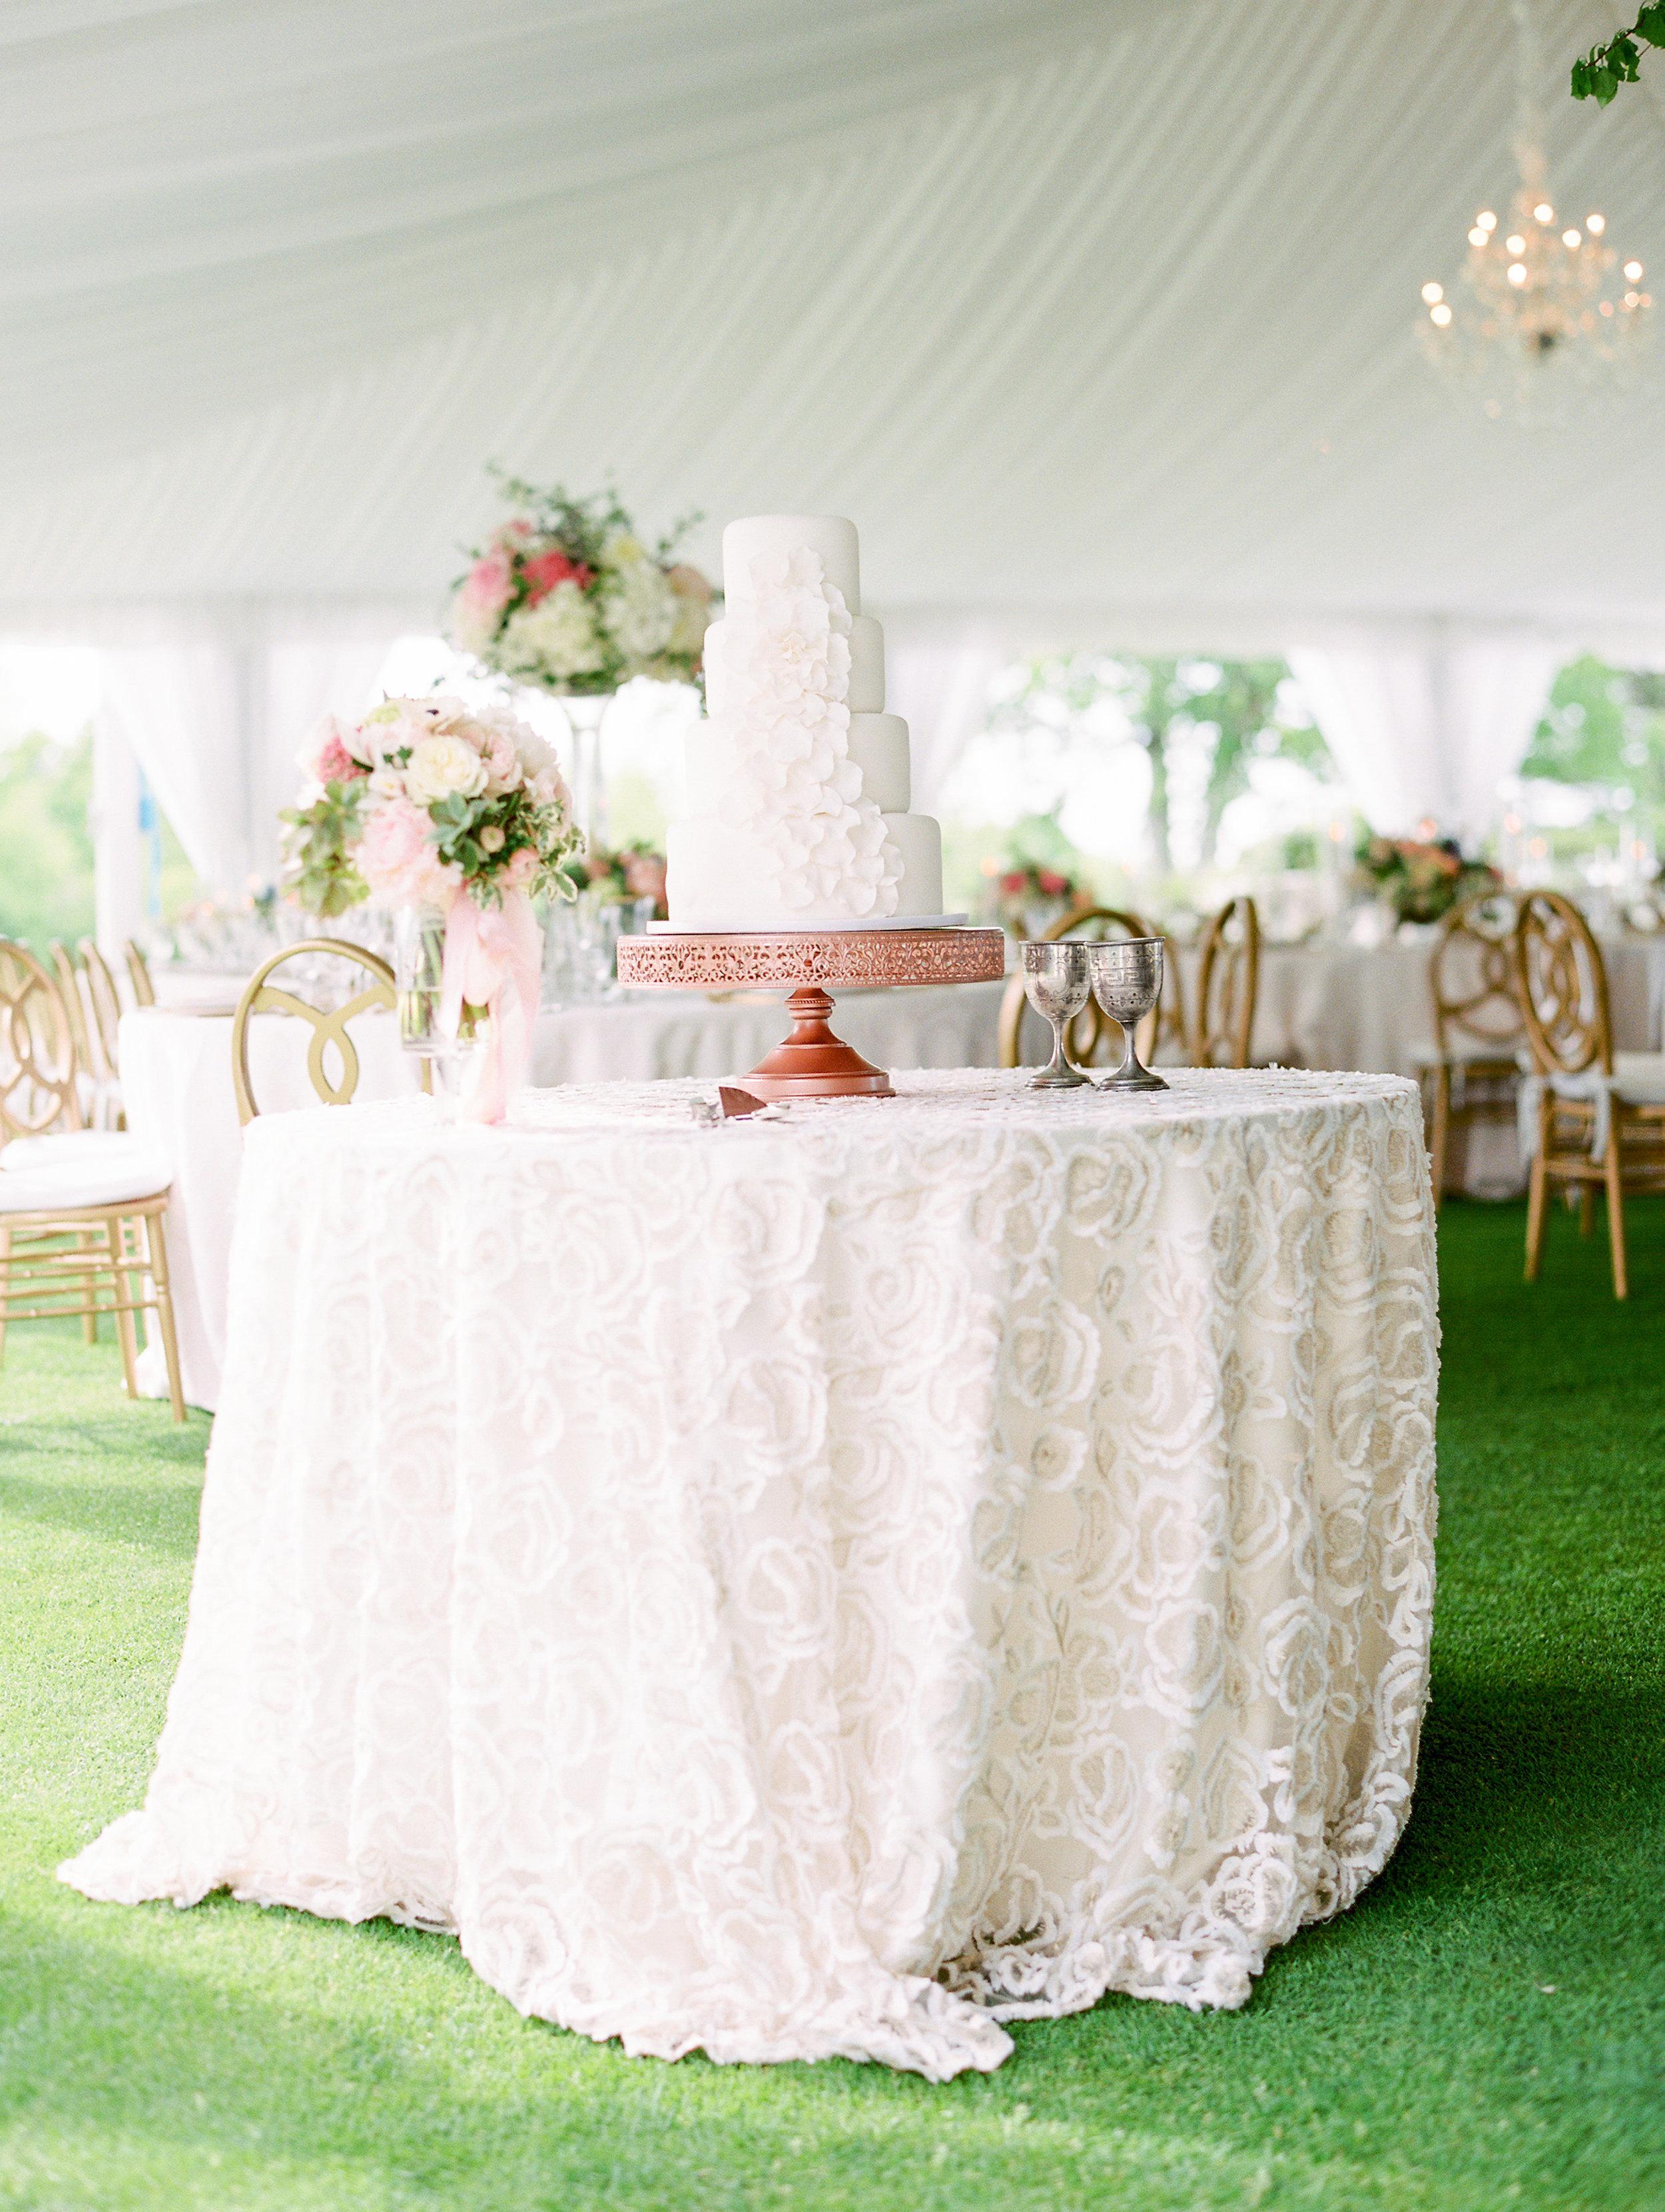 Coffman+Wedding+Reception+Details-89.jpg